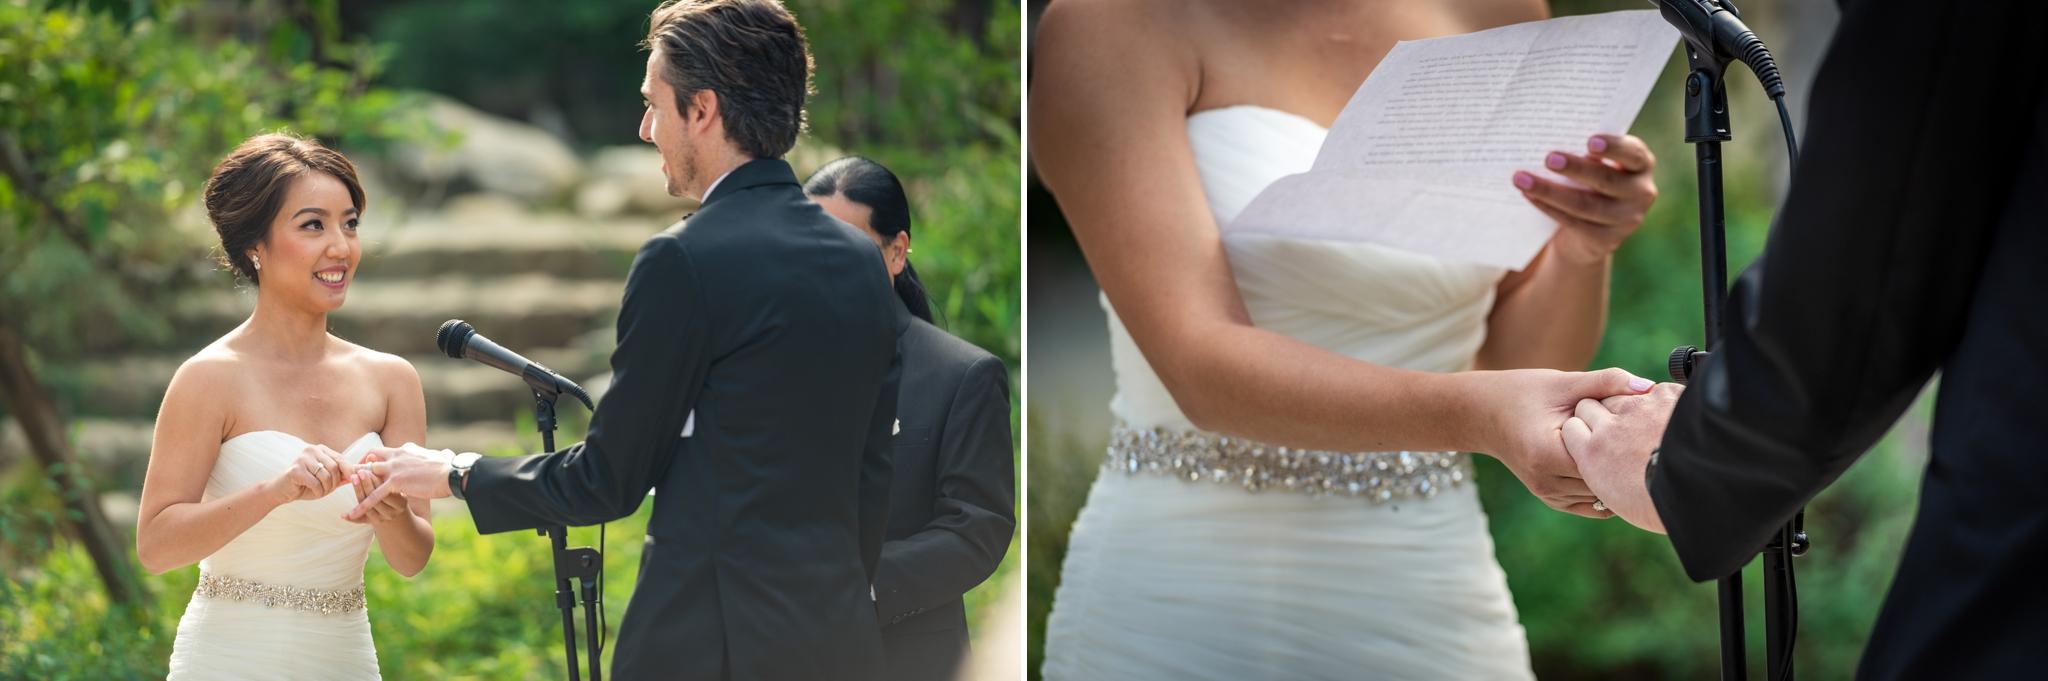 Lancy-Adam-Ceremony-Wedding-Hakone-Saratoga-Satvedi-Photography